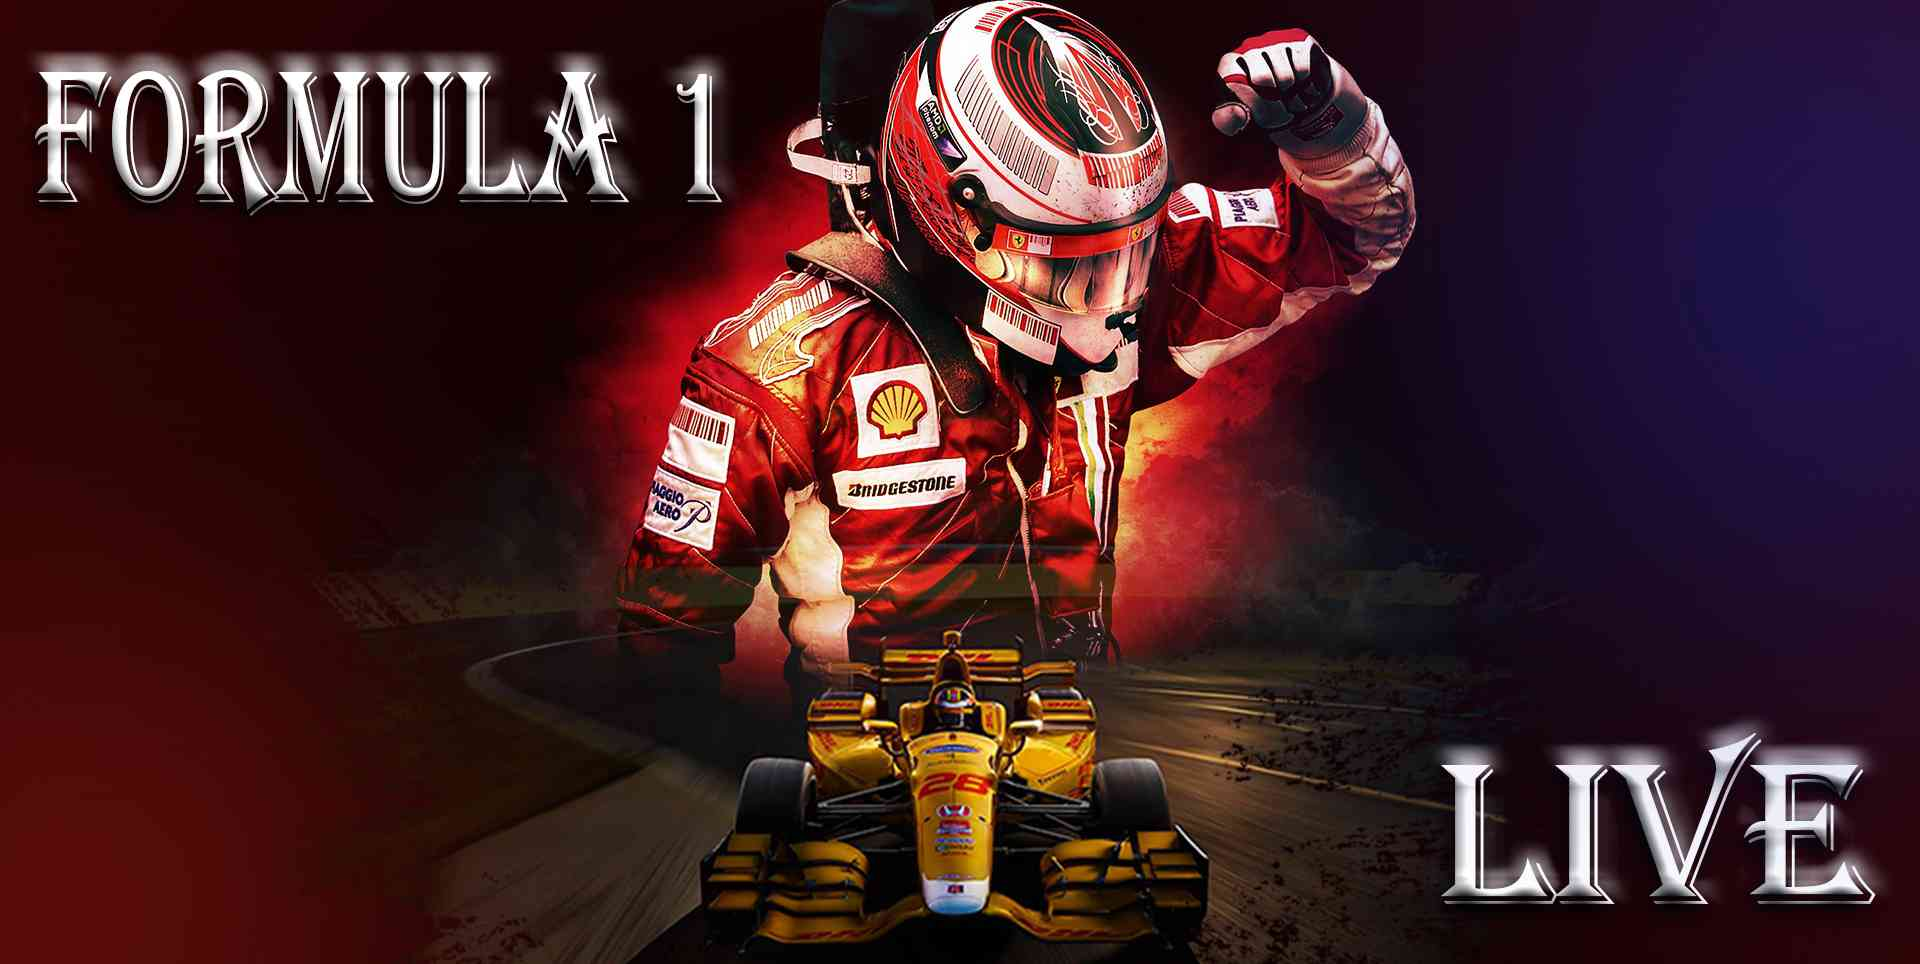 2016-italian-formula-4-adria-racing-live-streaming